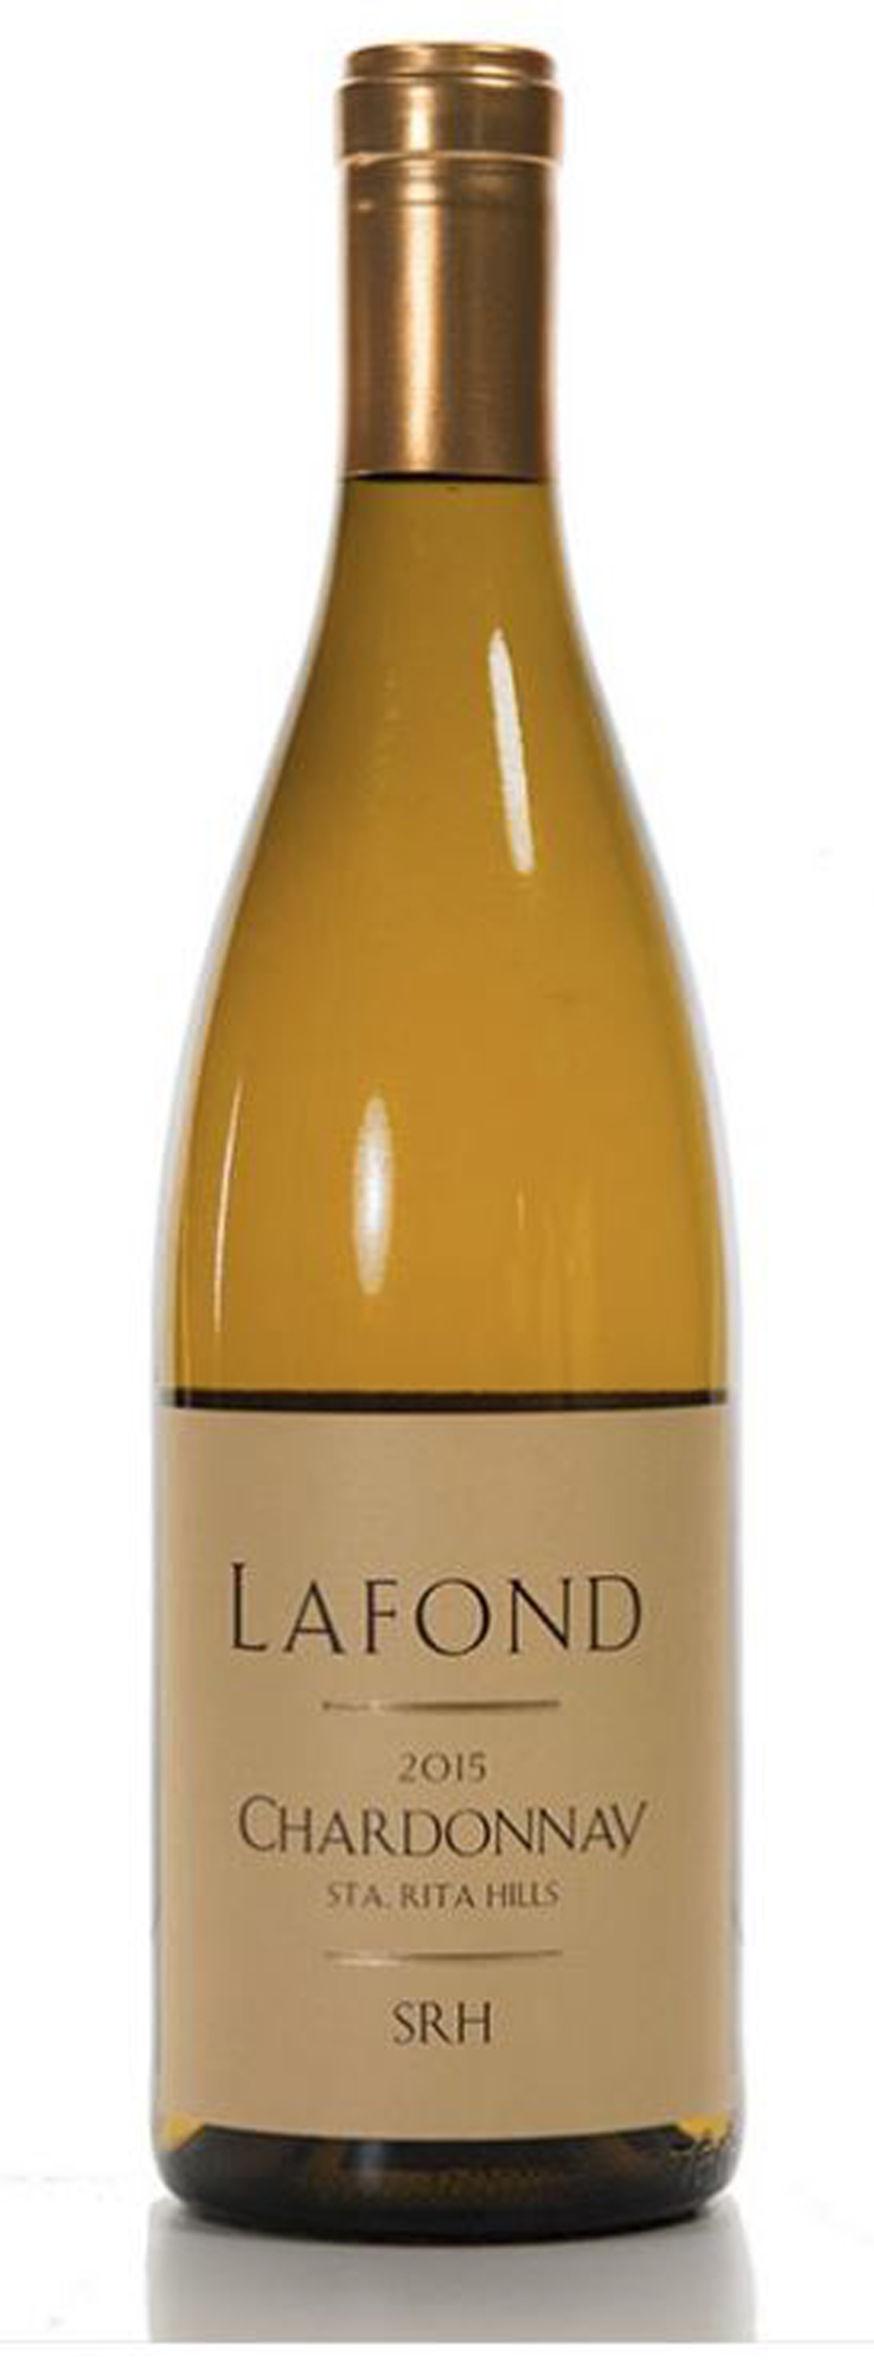 Lafond's 2015 Sta. Rita Hills Chardonnay